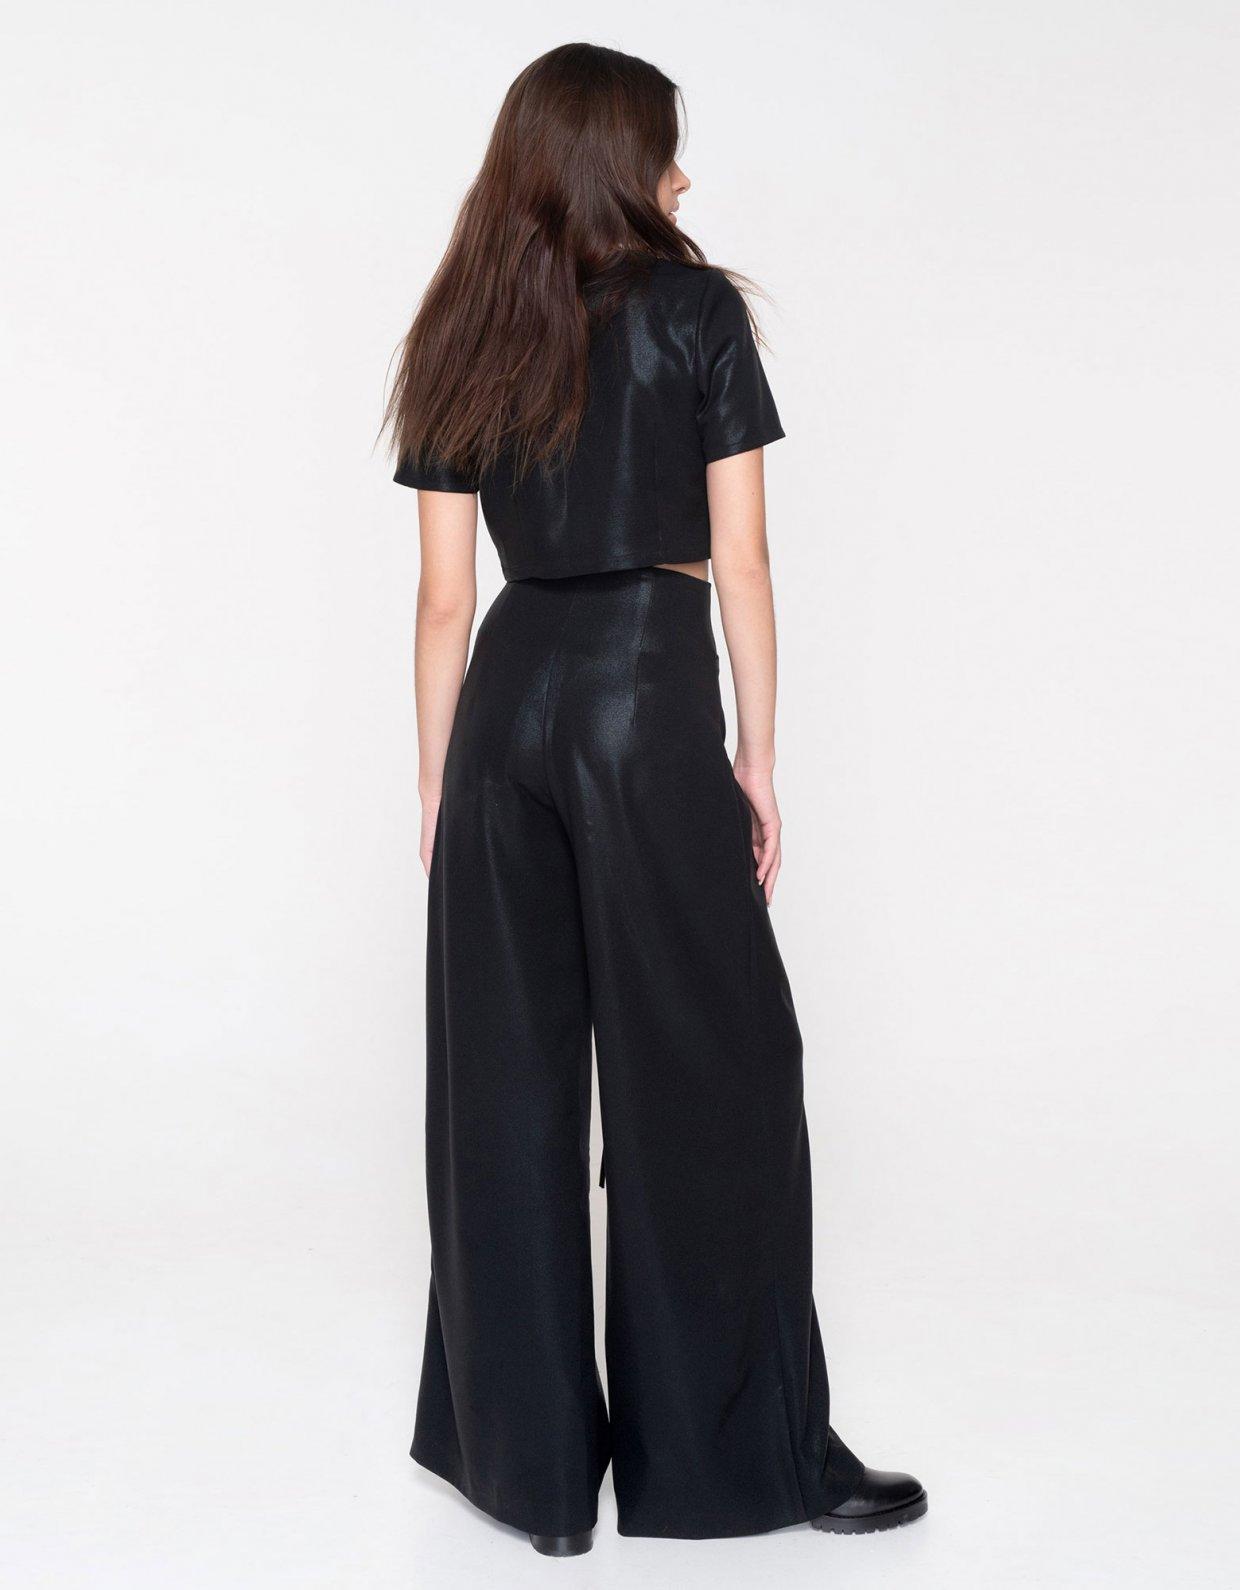 Nadia Rapti Metallic Black Sabbath pants